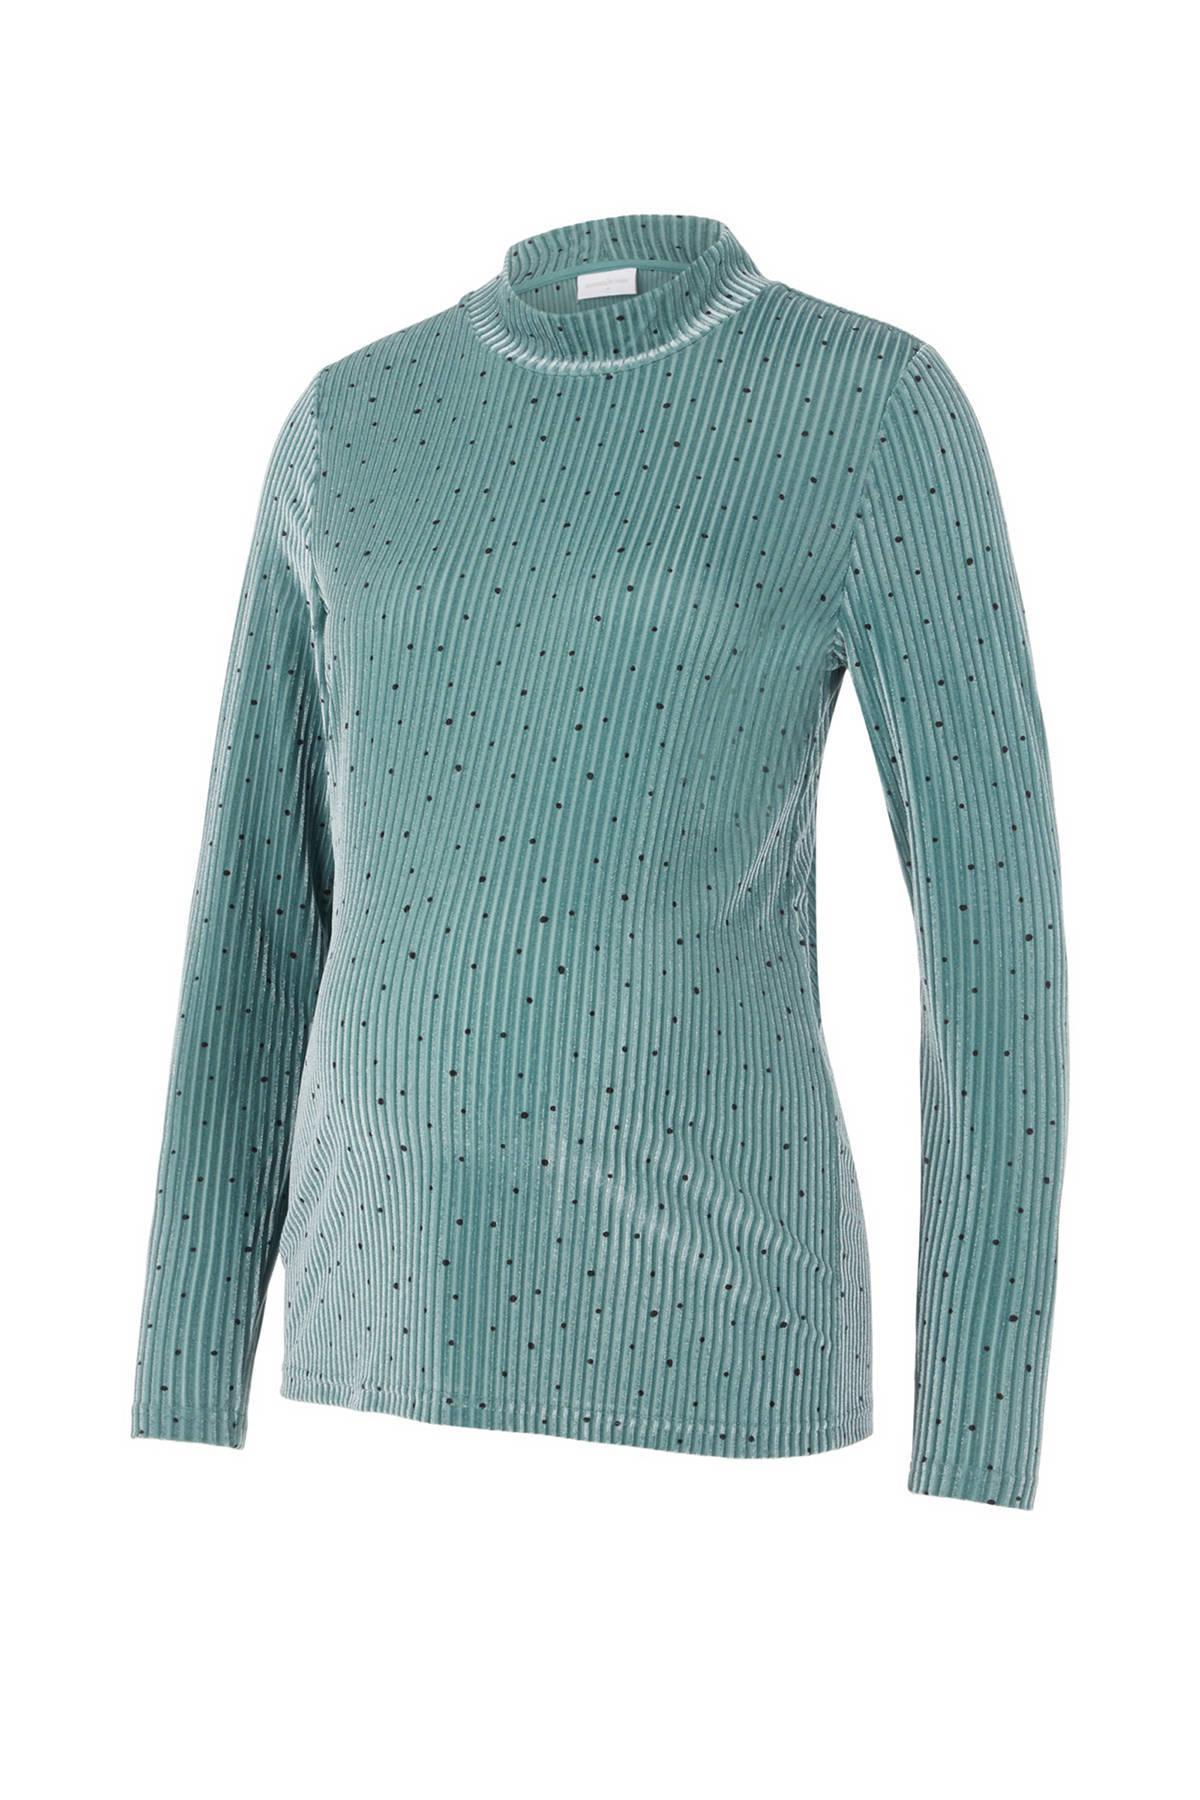 MAMALICIOUS ribgebreide zwangerschapslongsleeve Elle met all over print turquoise online kopen